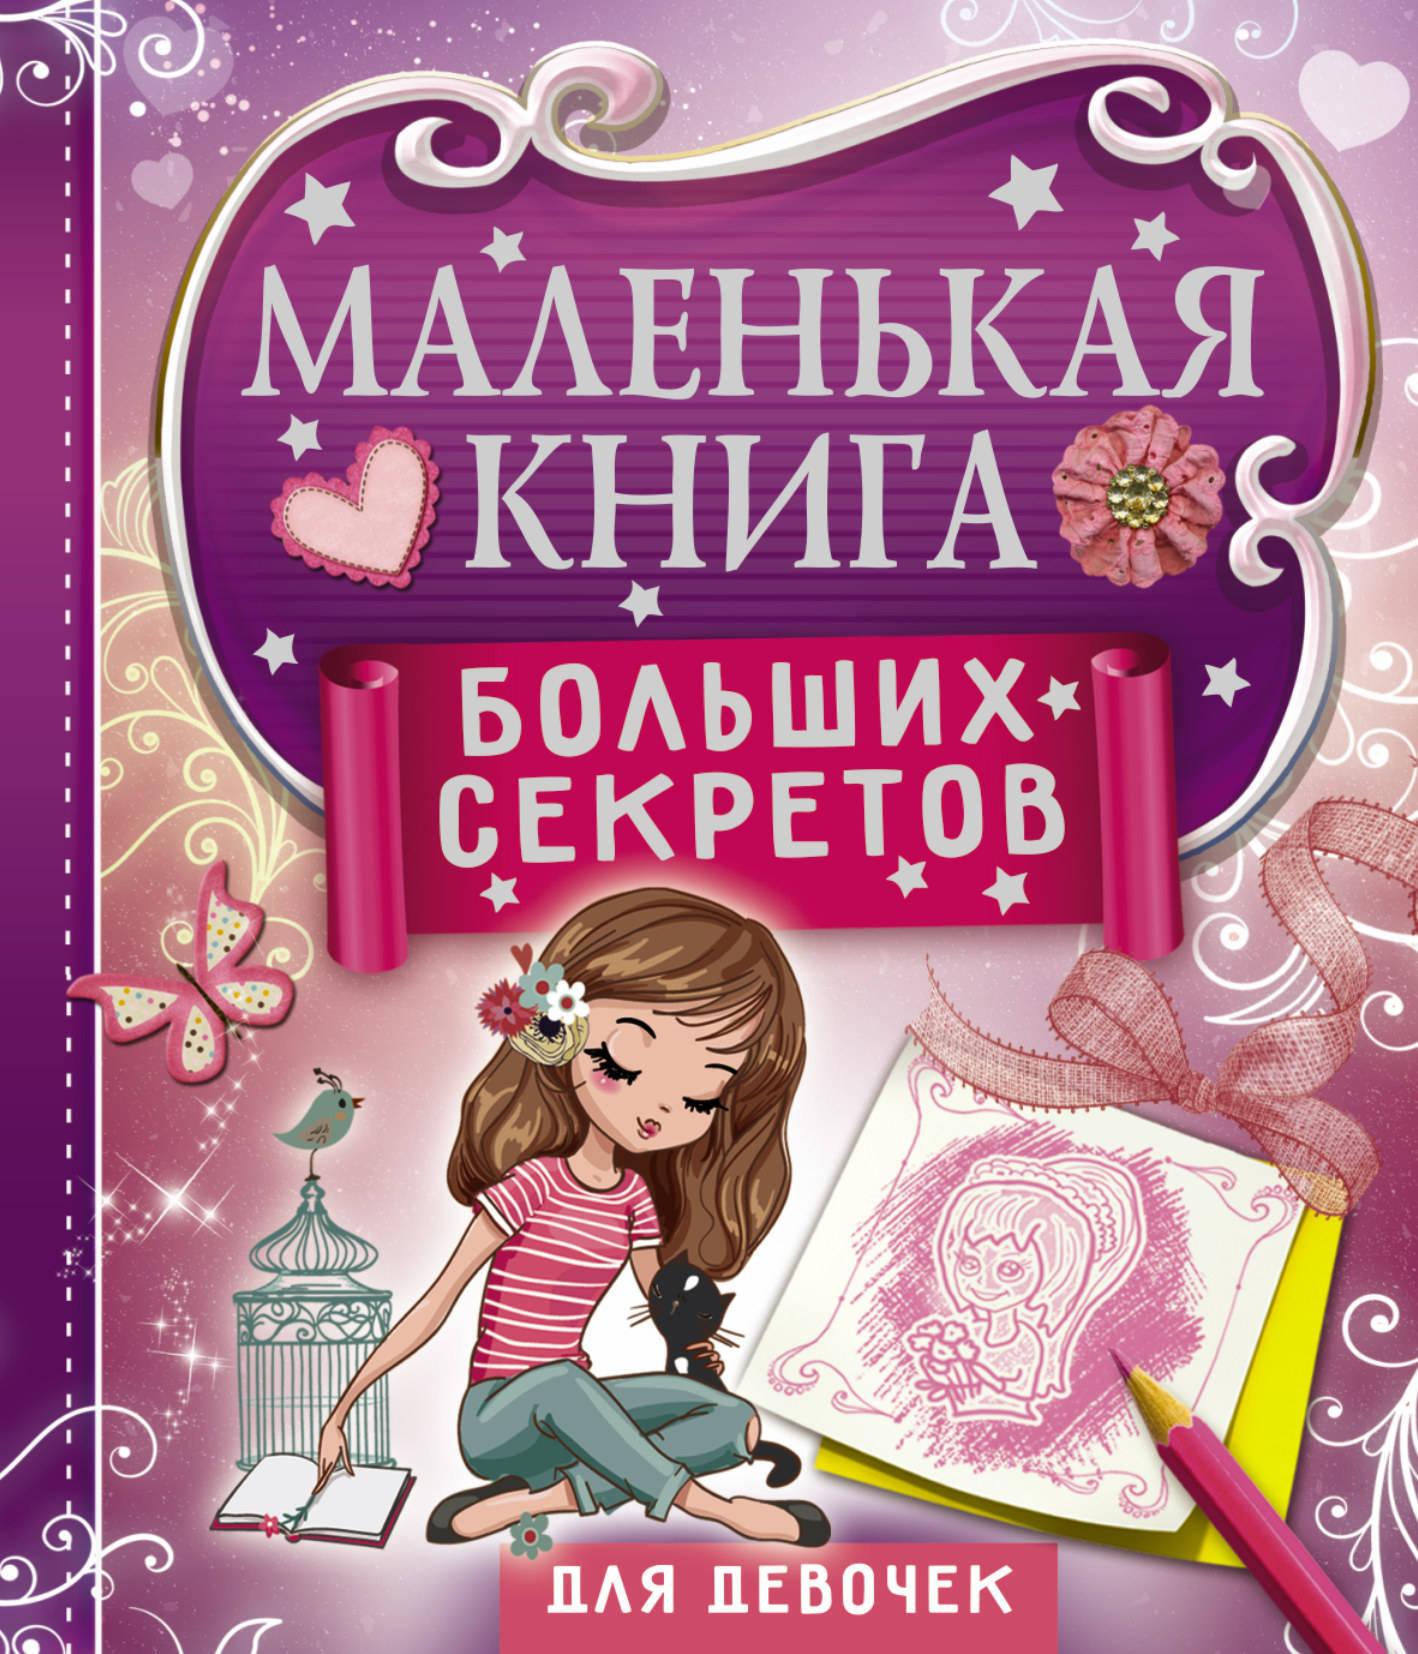 Книги для девчонок картинки